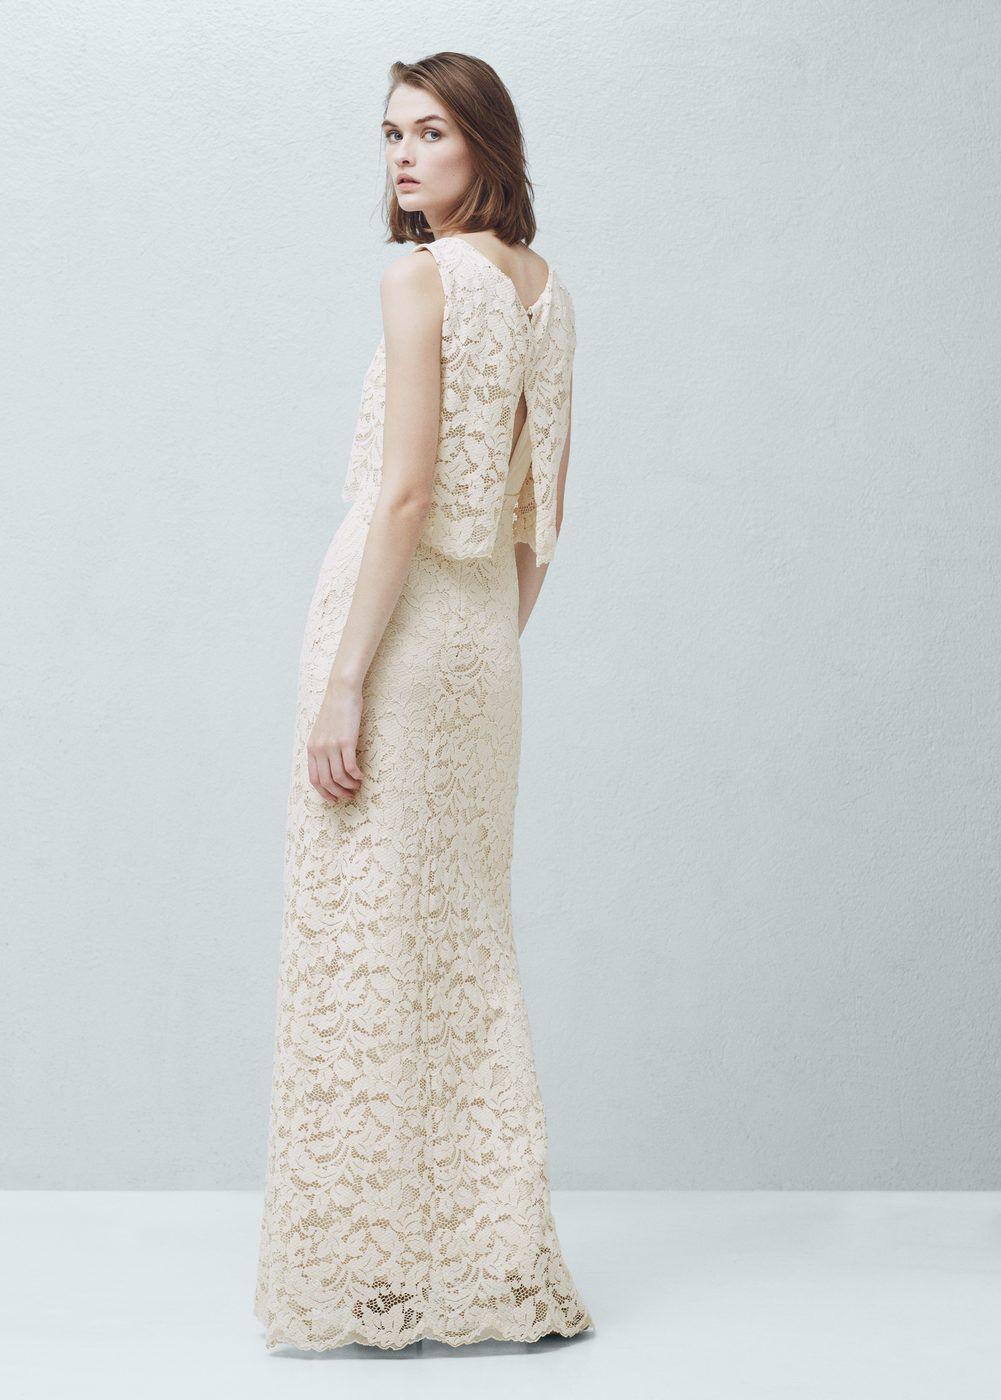 0d0f4b9bf Vestido guipur - Mujer